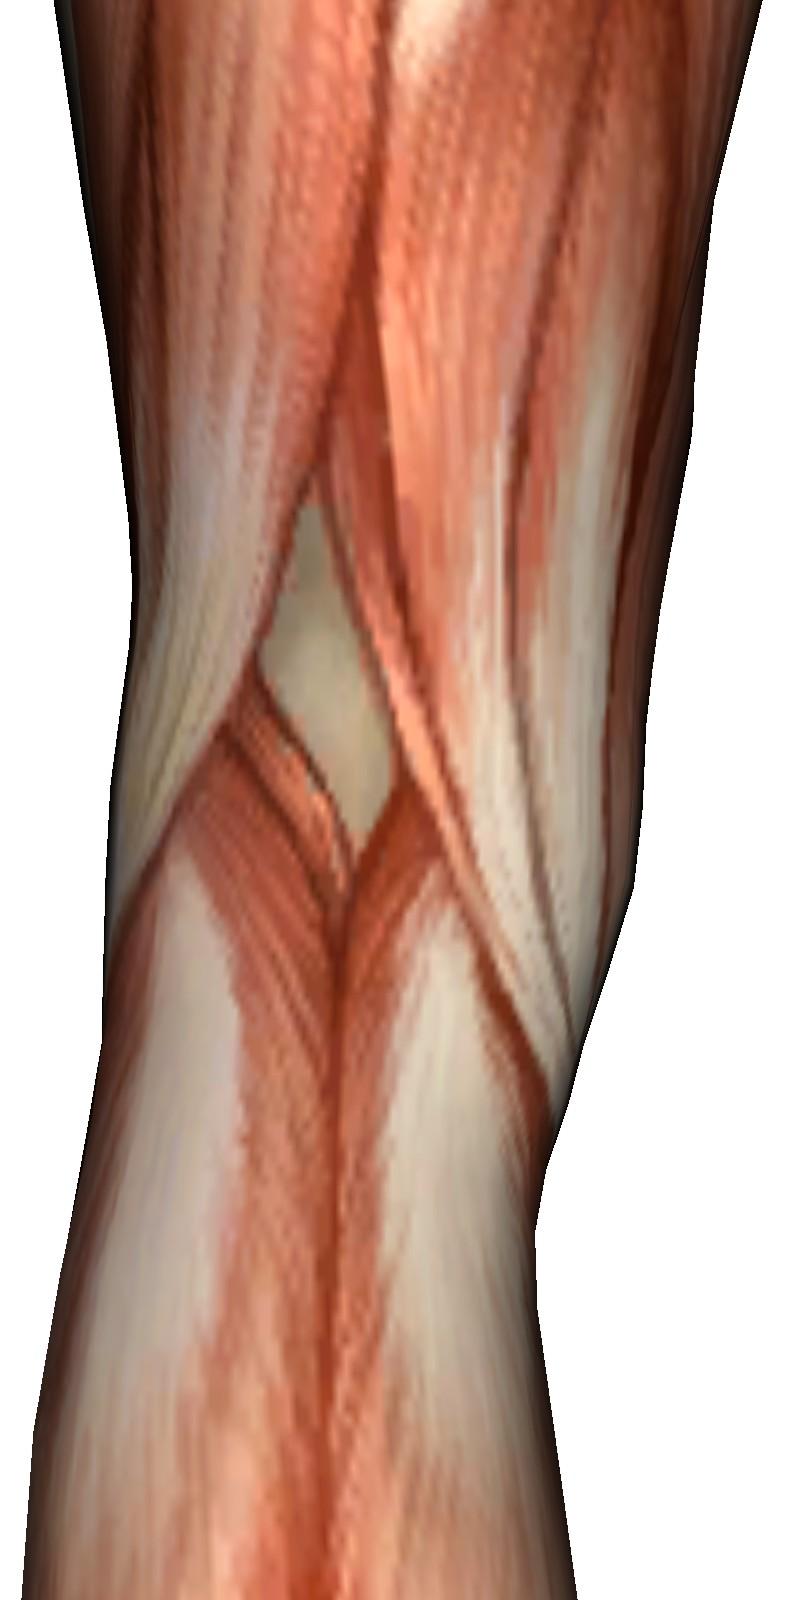 Body Parts Muscles - Massage, Massage Videos, Massage Pictures ...